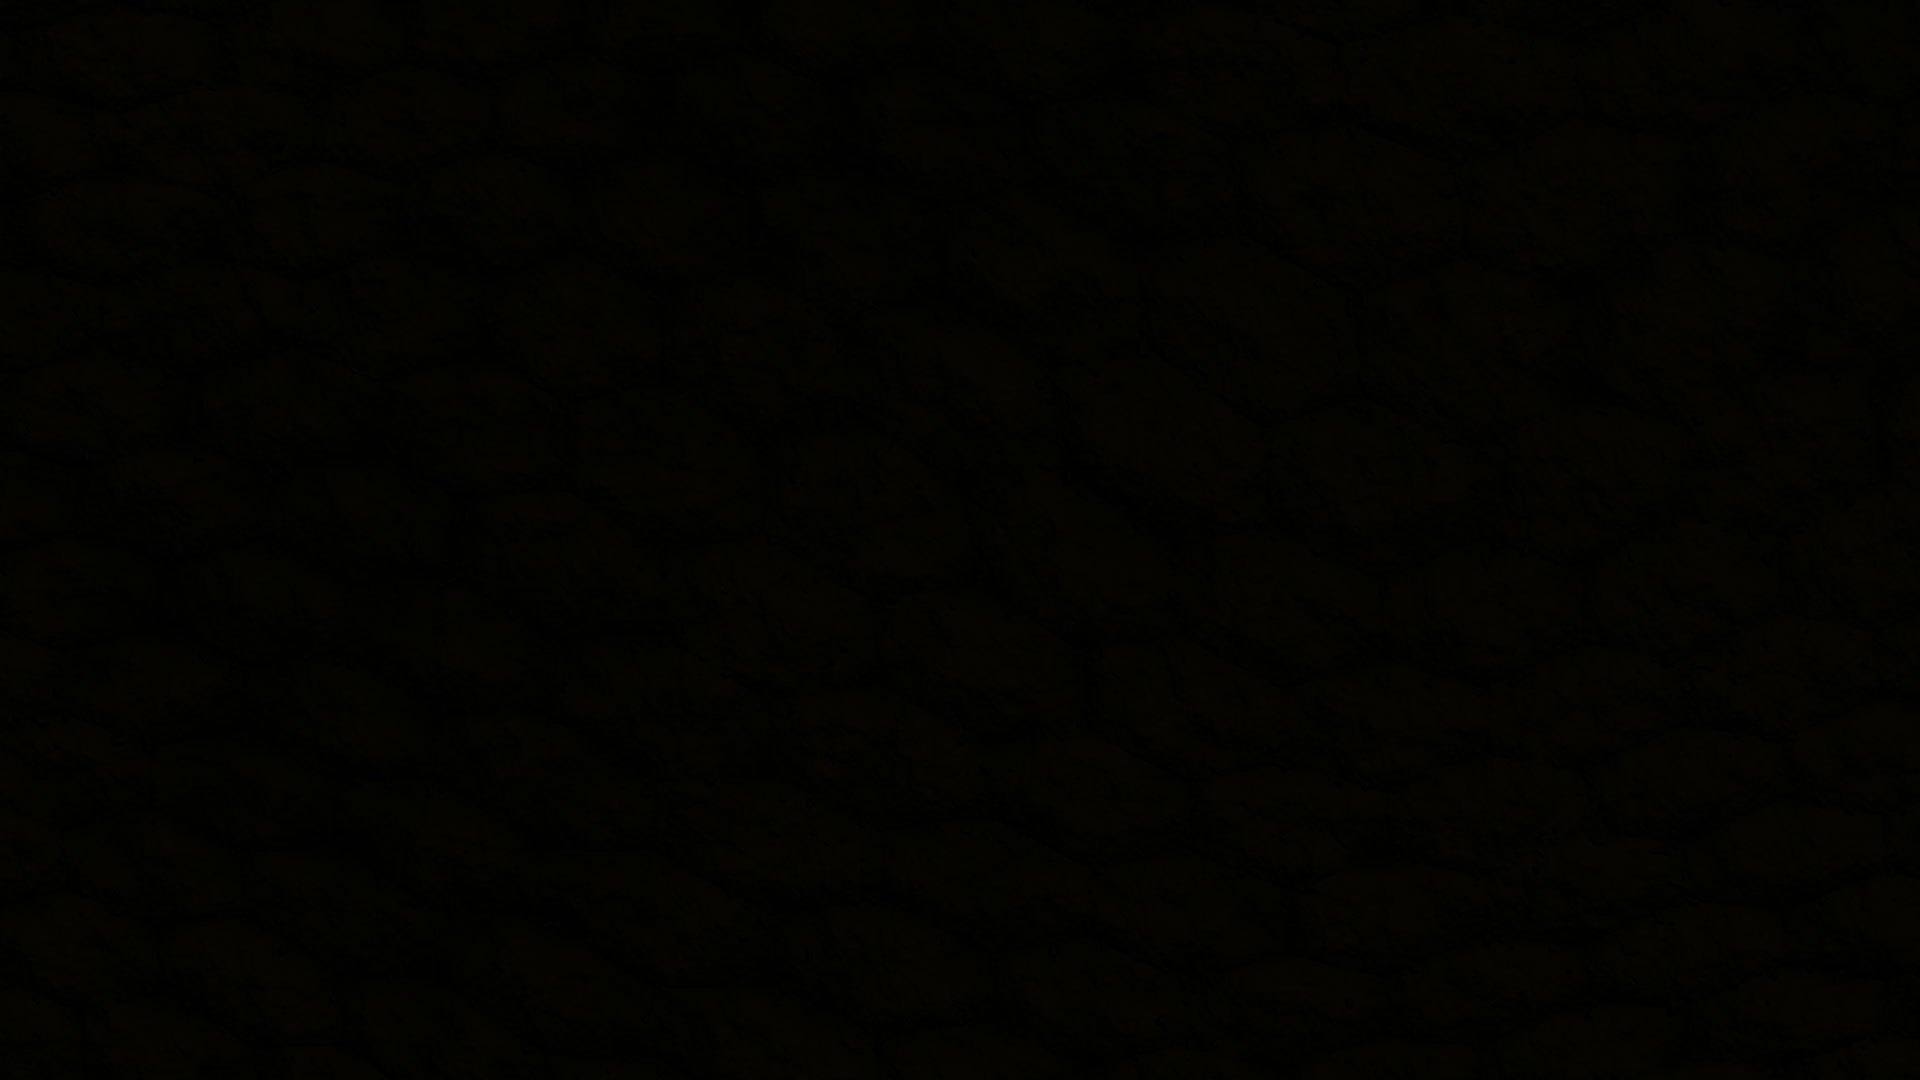 6198987-black-pic.jpg